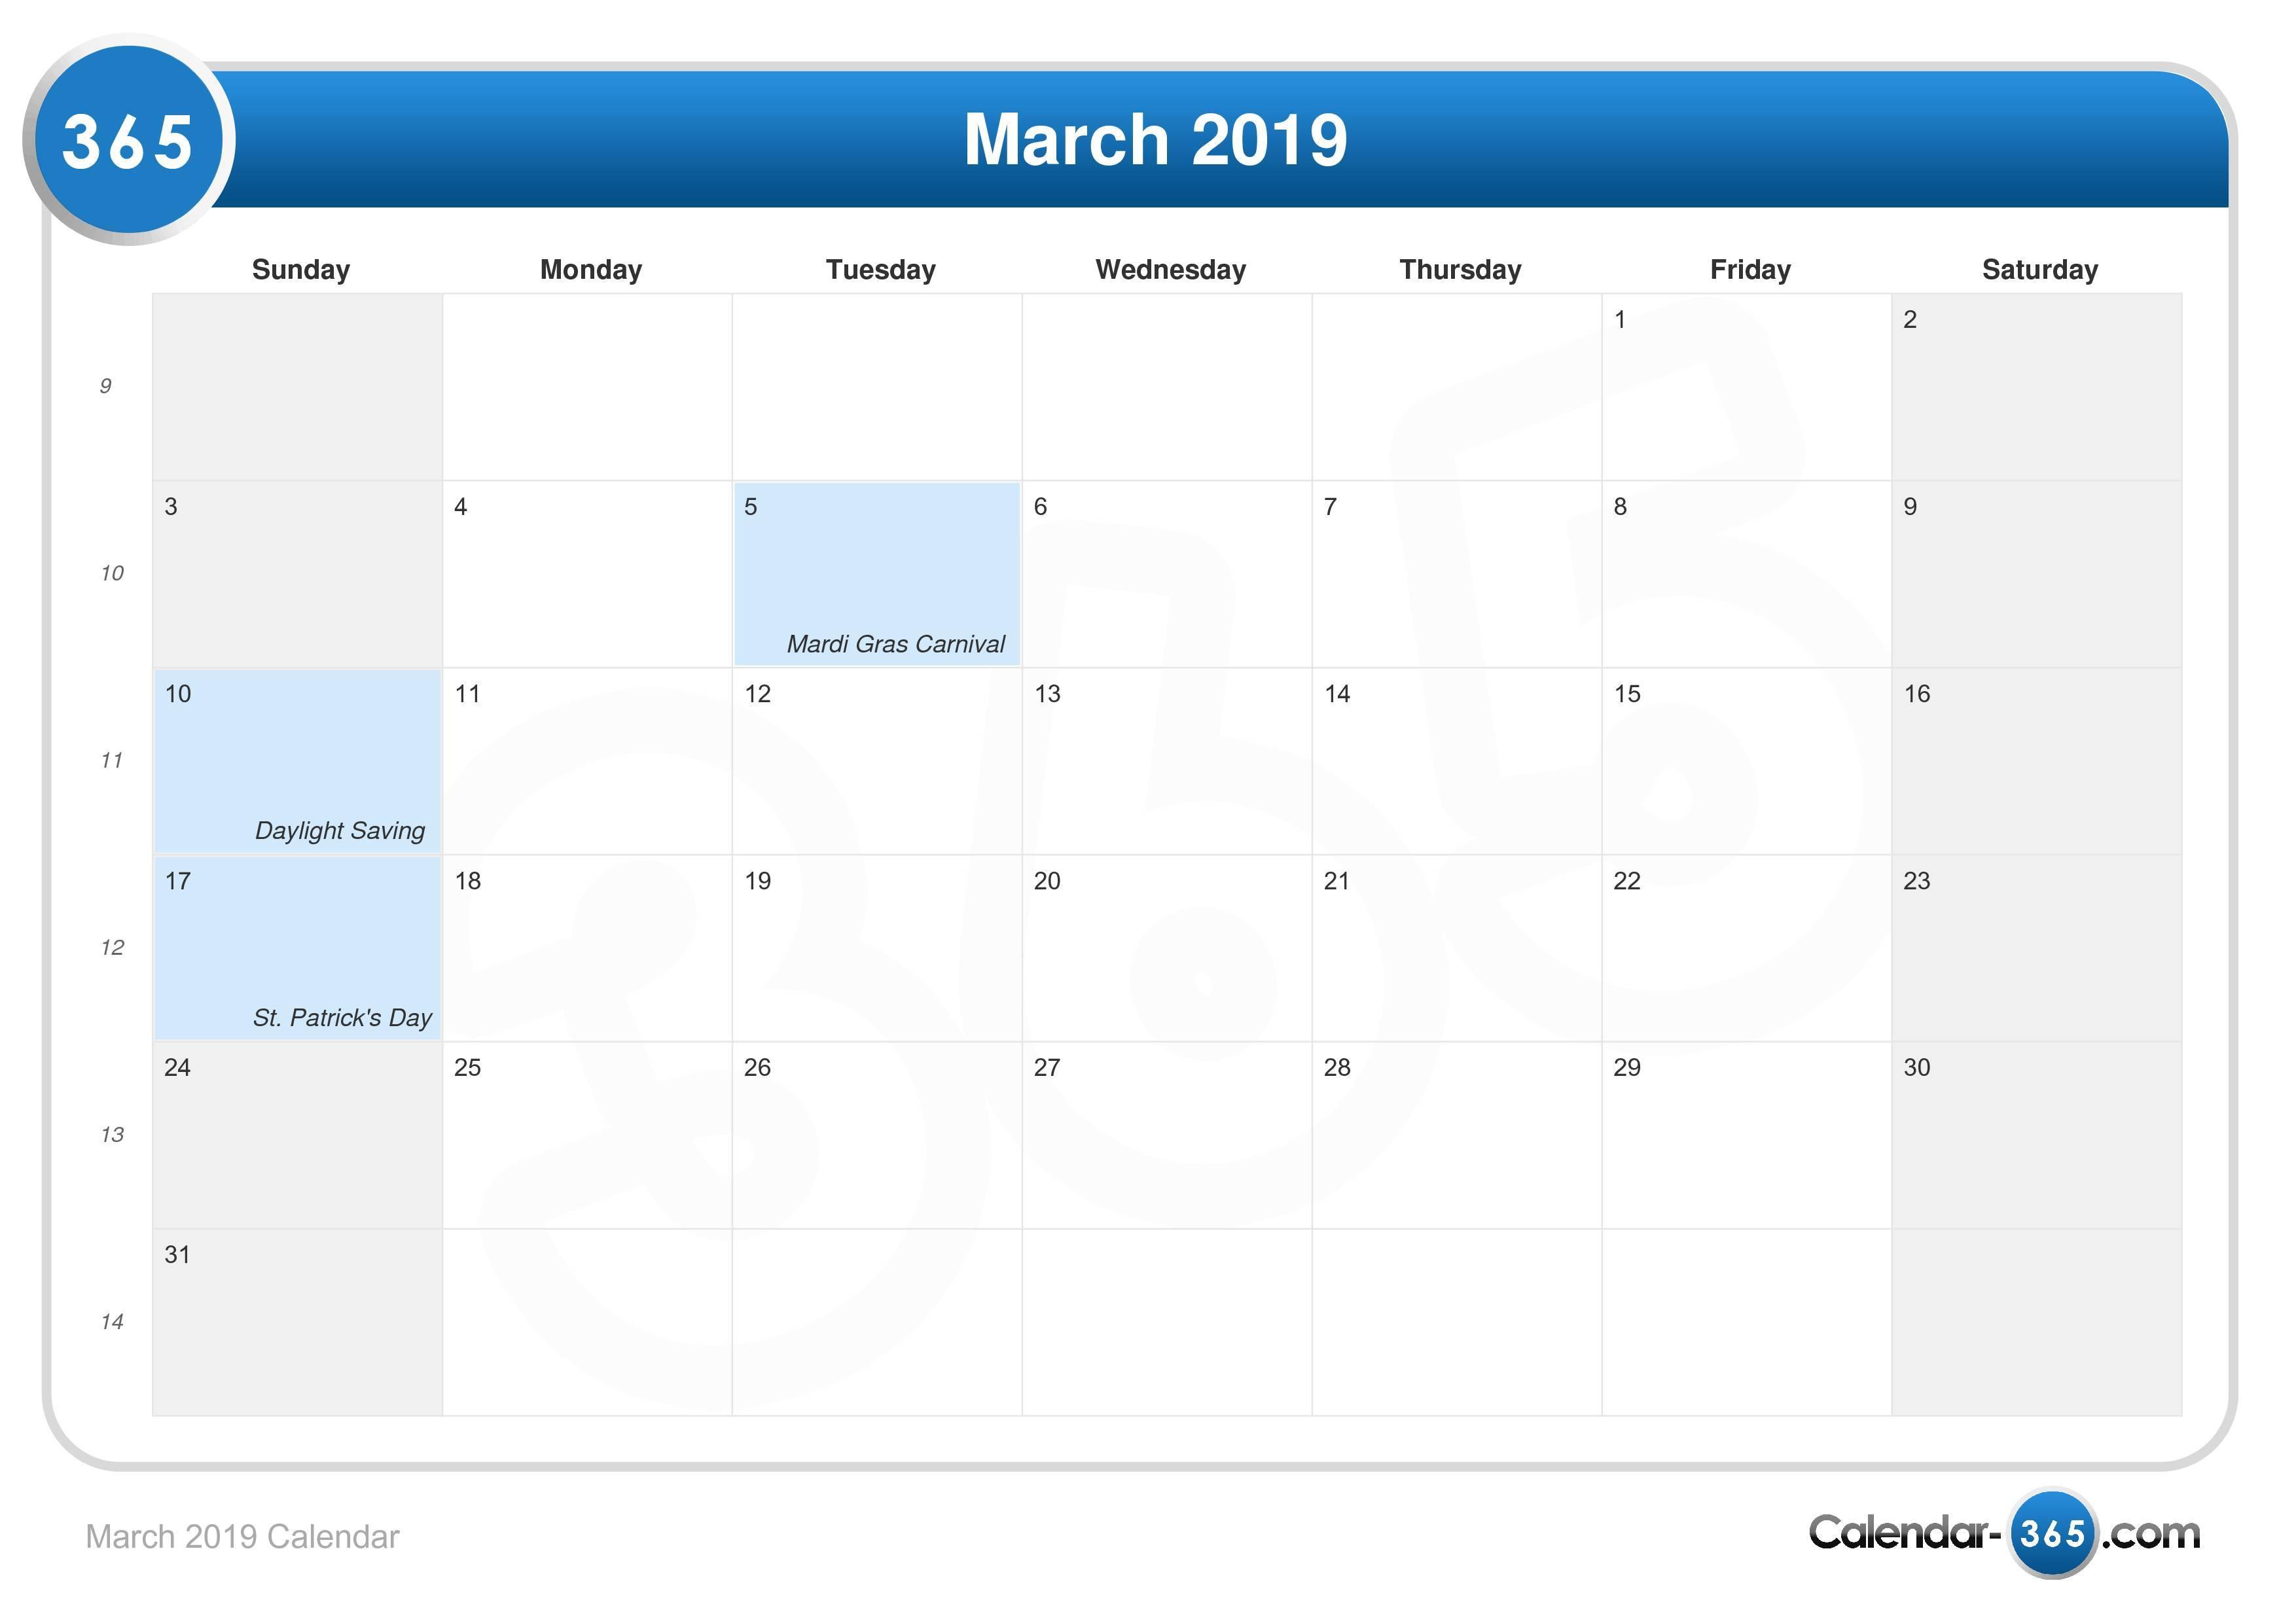 March 2019 Calendar - Free Printable - AllFreePrintable.com